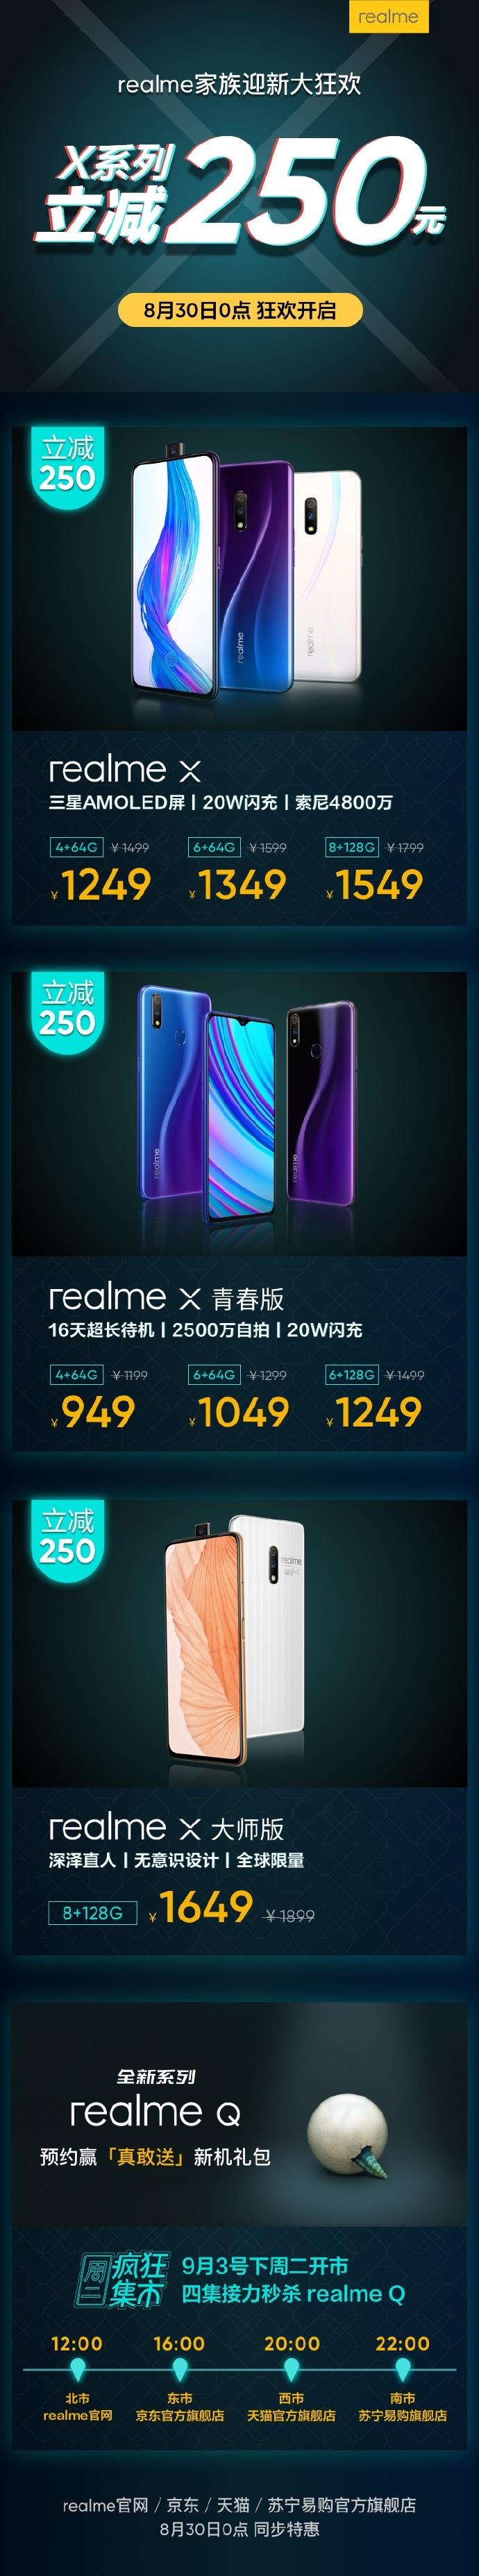 realme X开启狂欢:全系直降250元-玩懂手机网 - 玩懂手机第一手的手机资讯网(www.wdshouji.com)